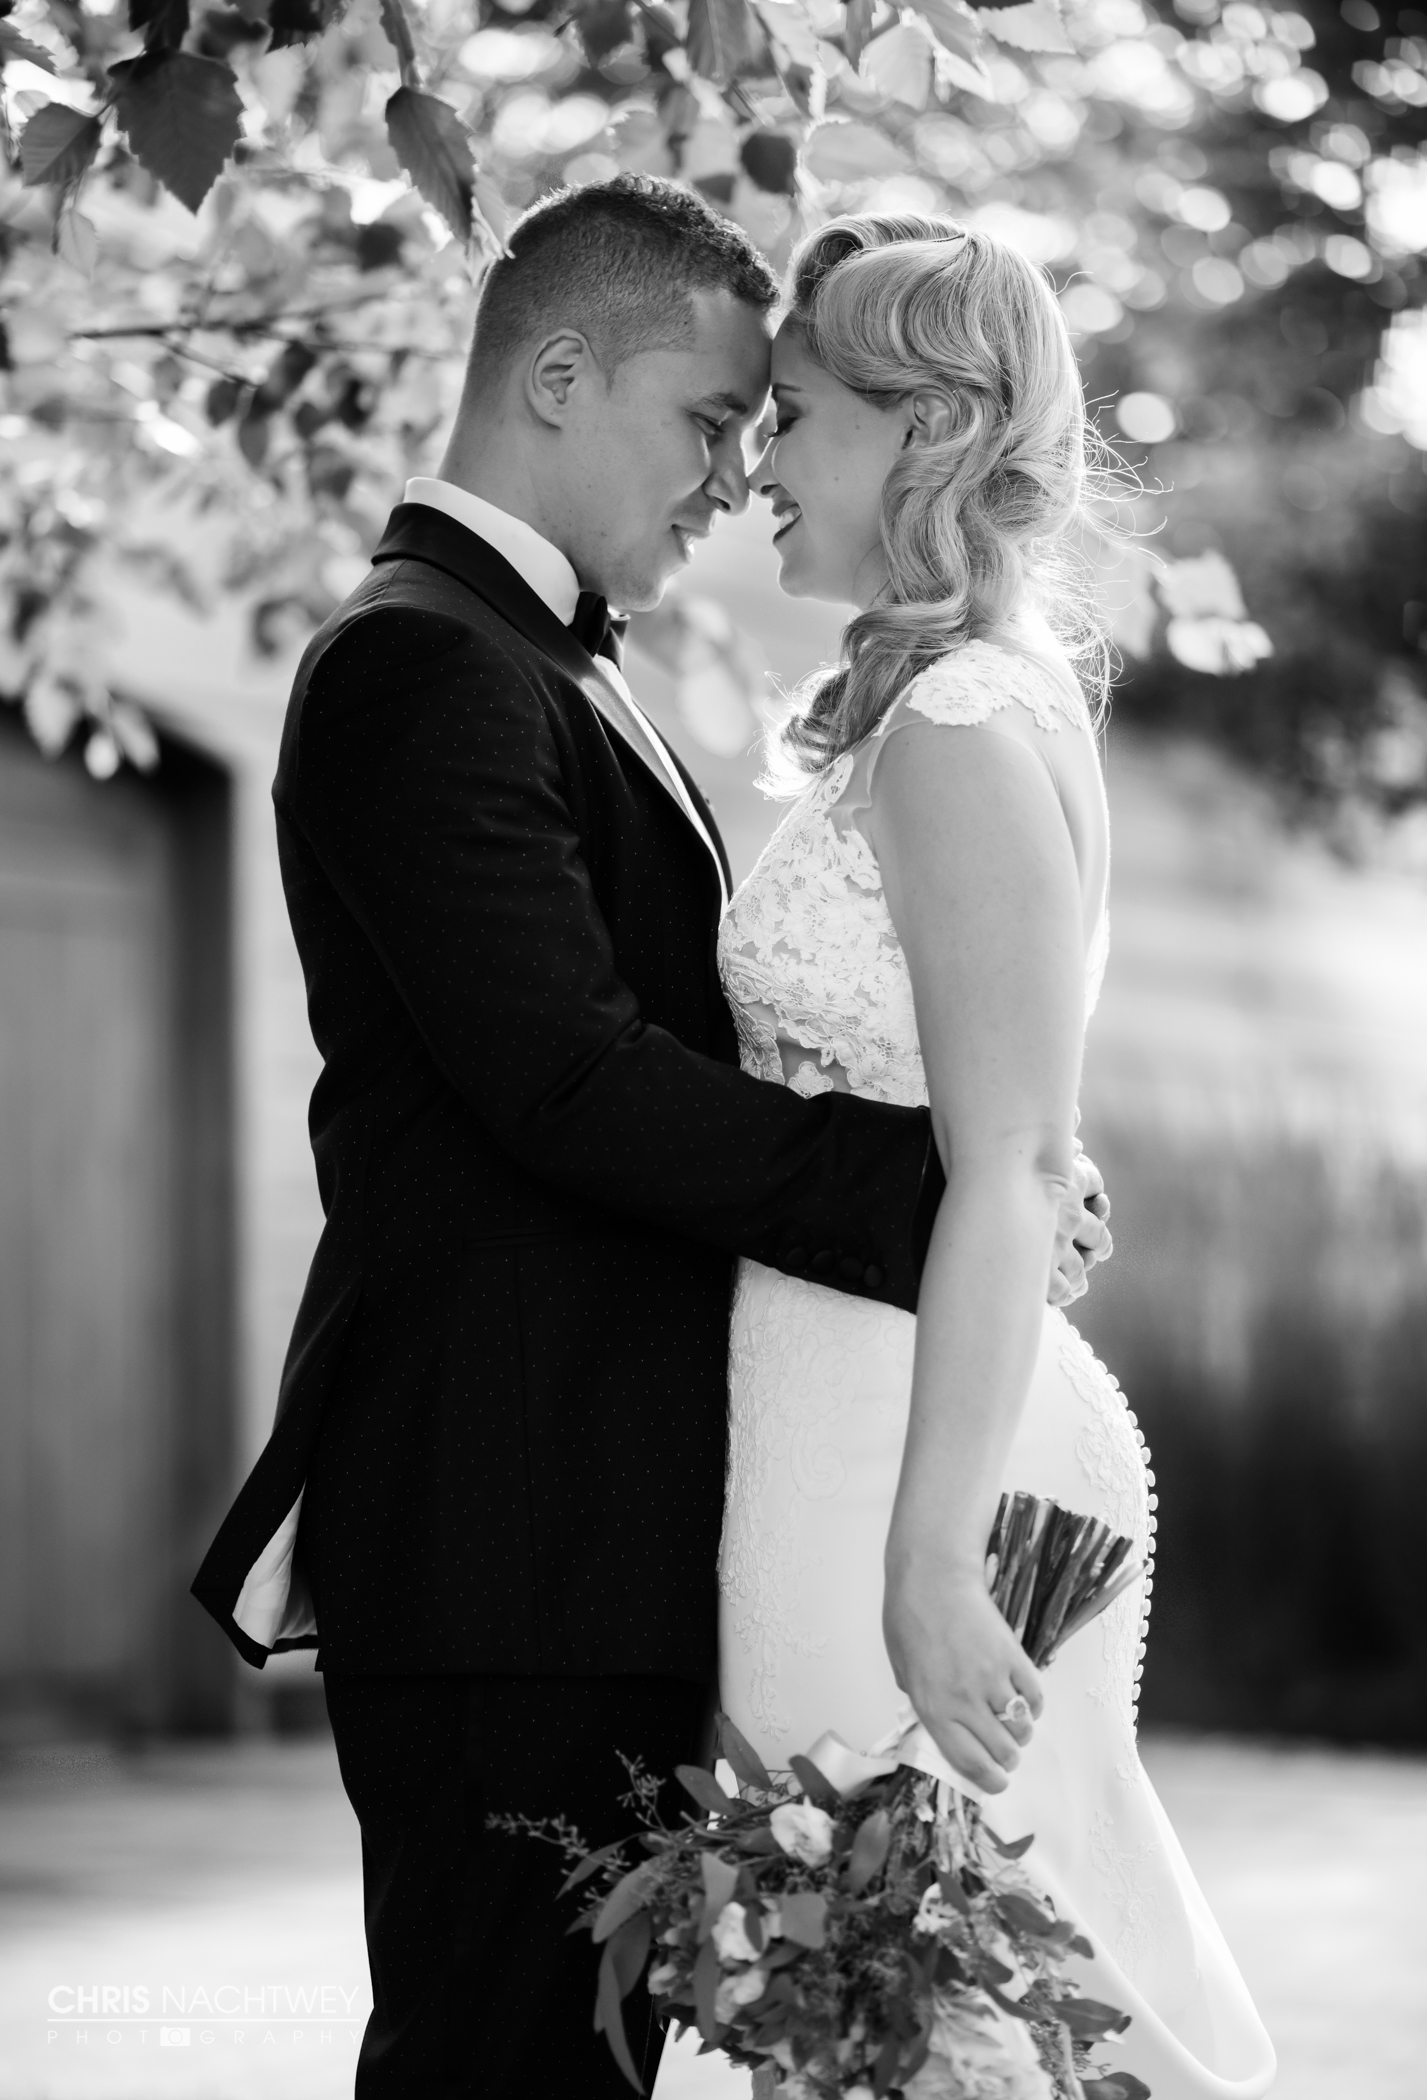 wedding-saltwater-farm-vineyard-photos-stonington-ct-chris-nachtwey-photography-2016-ana-austin-25.jpg